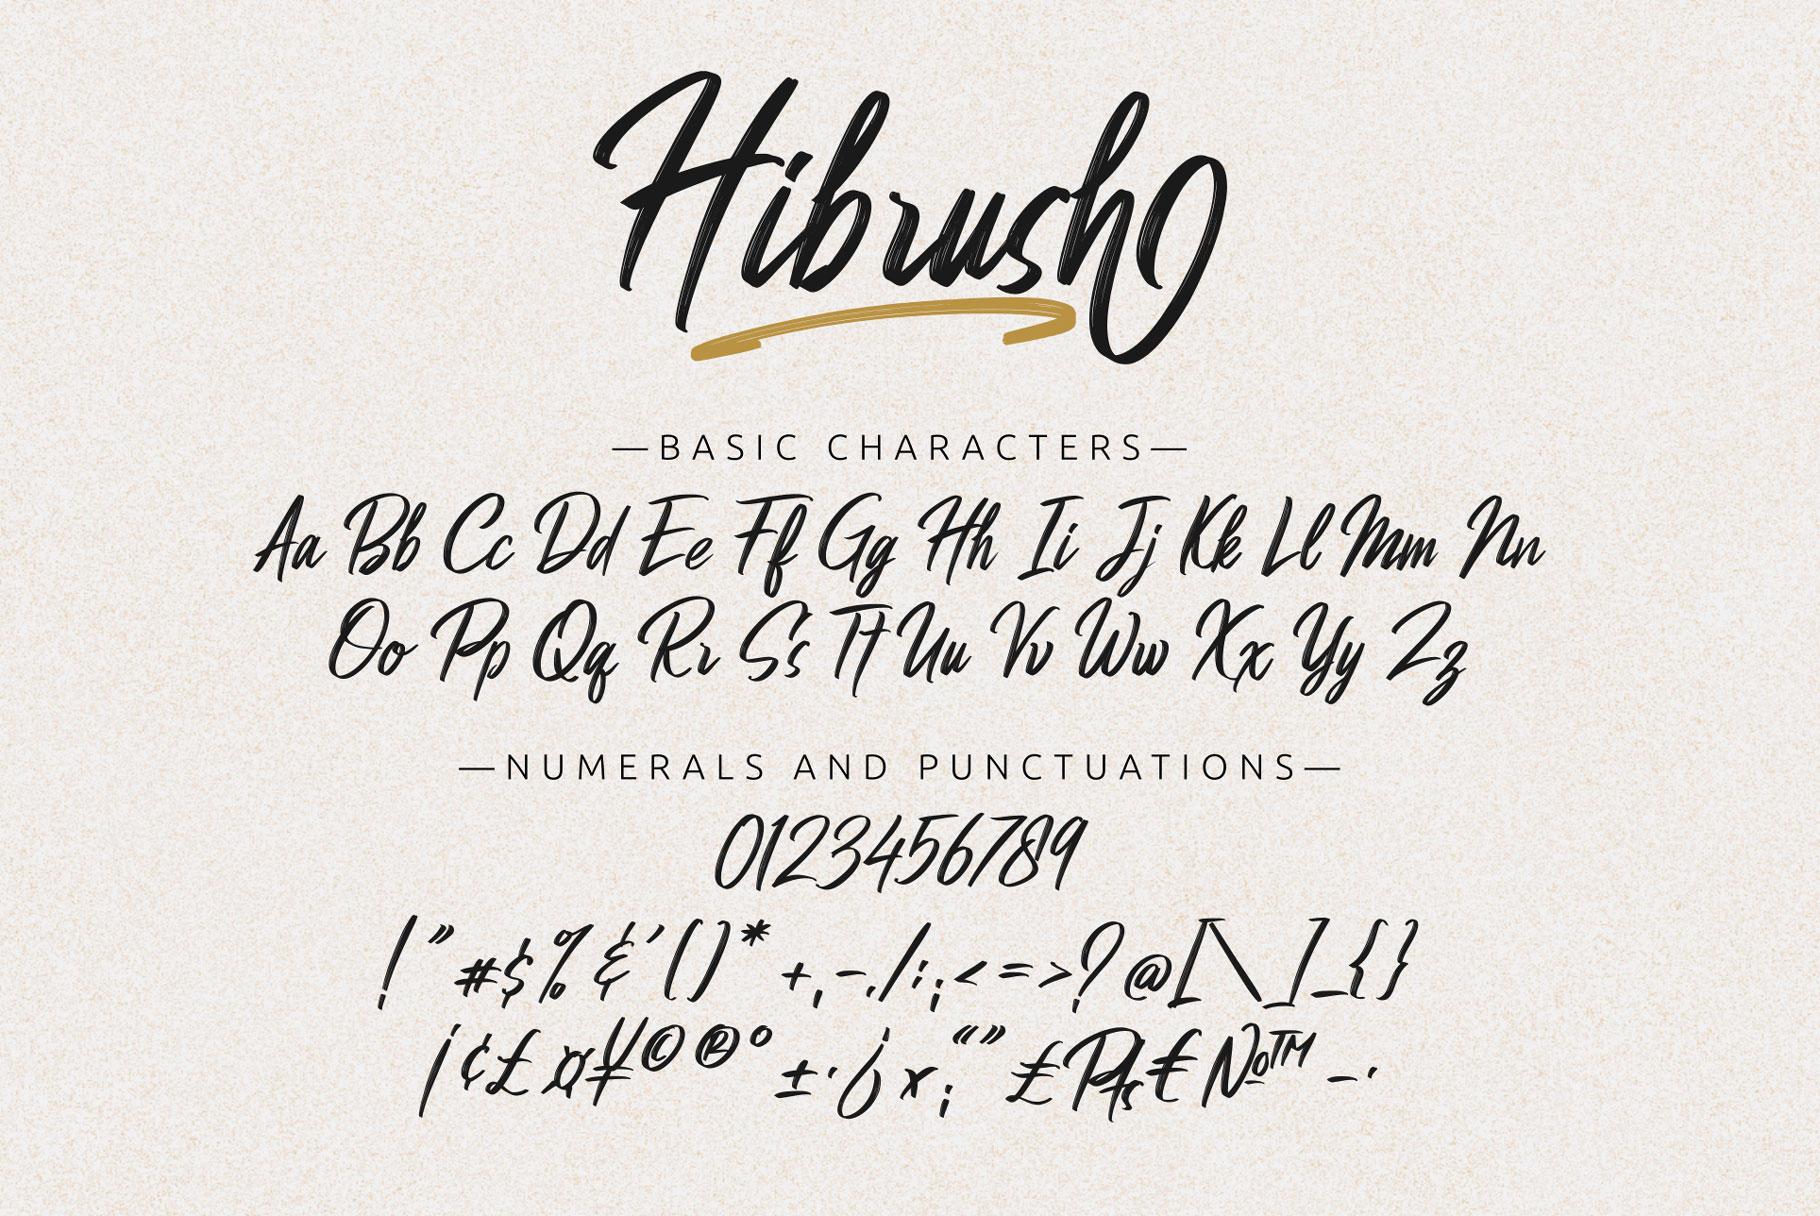 Hibrush Font03